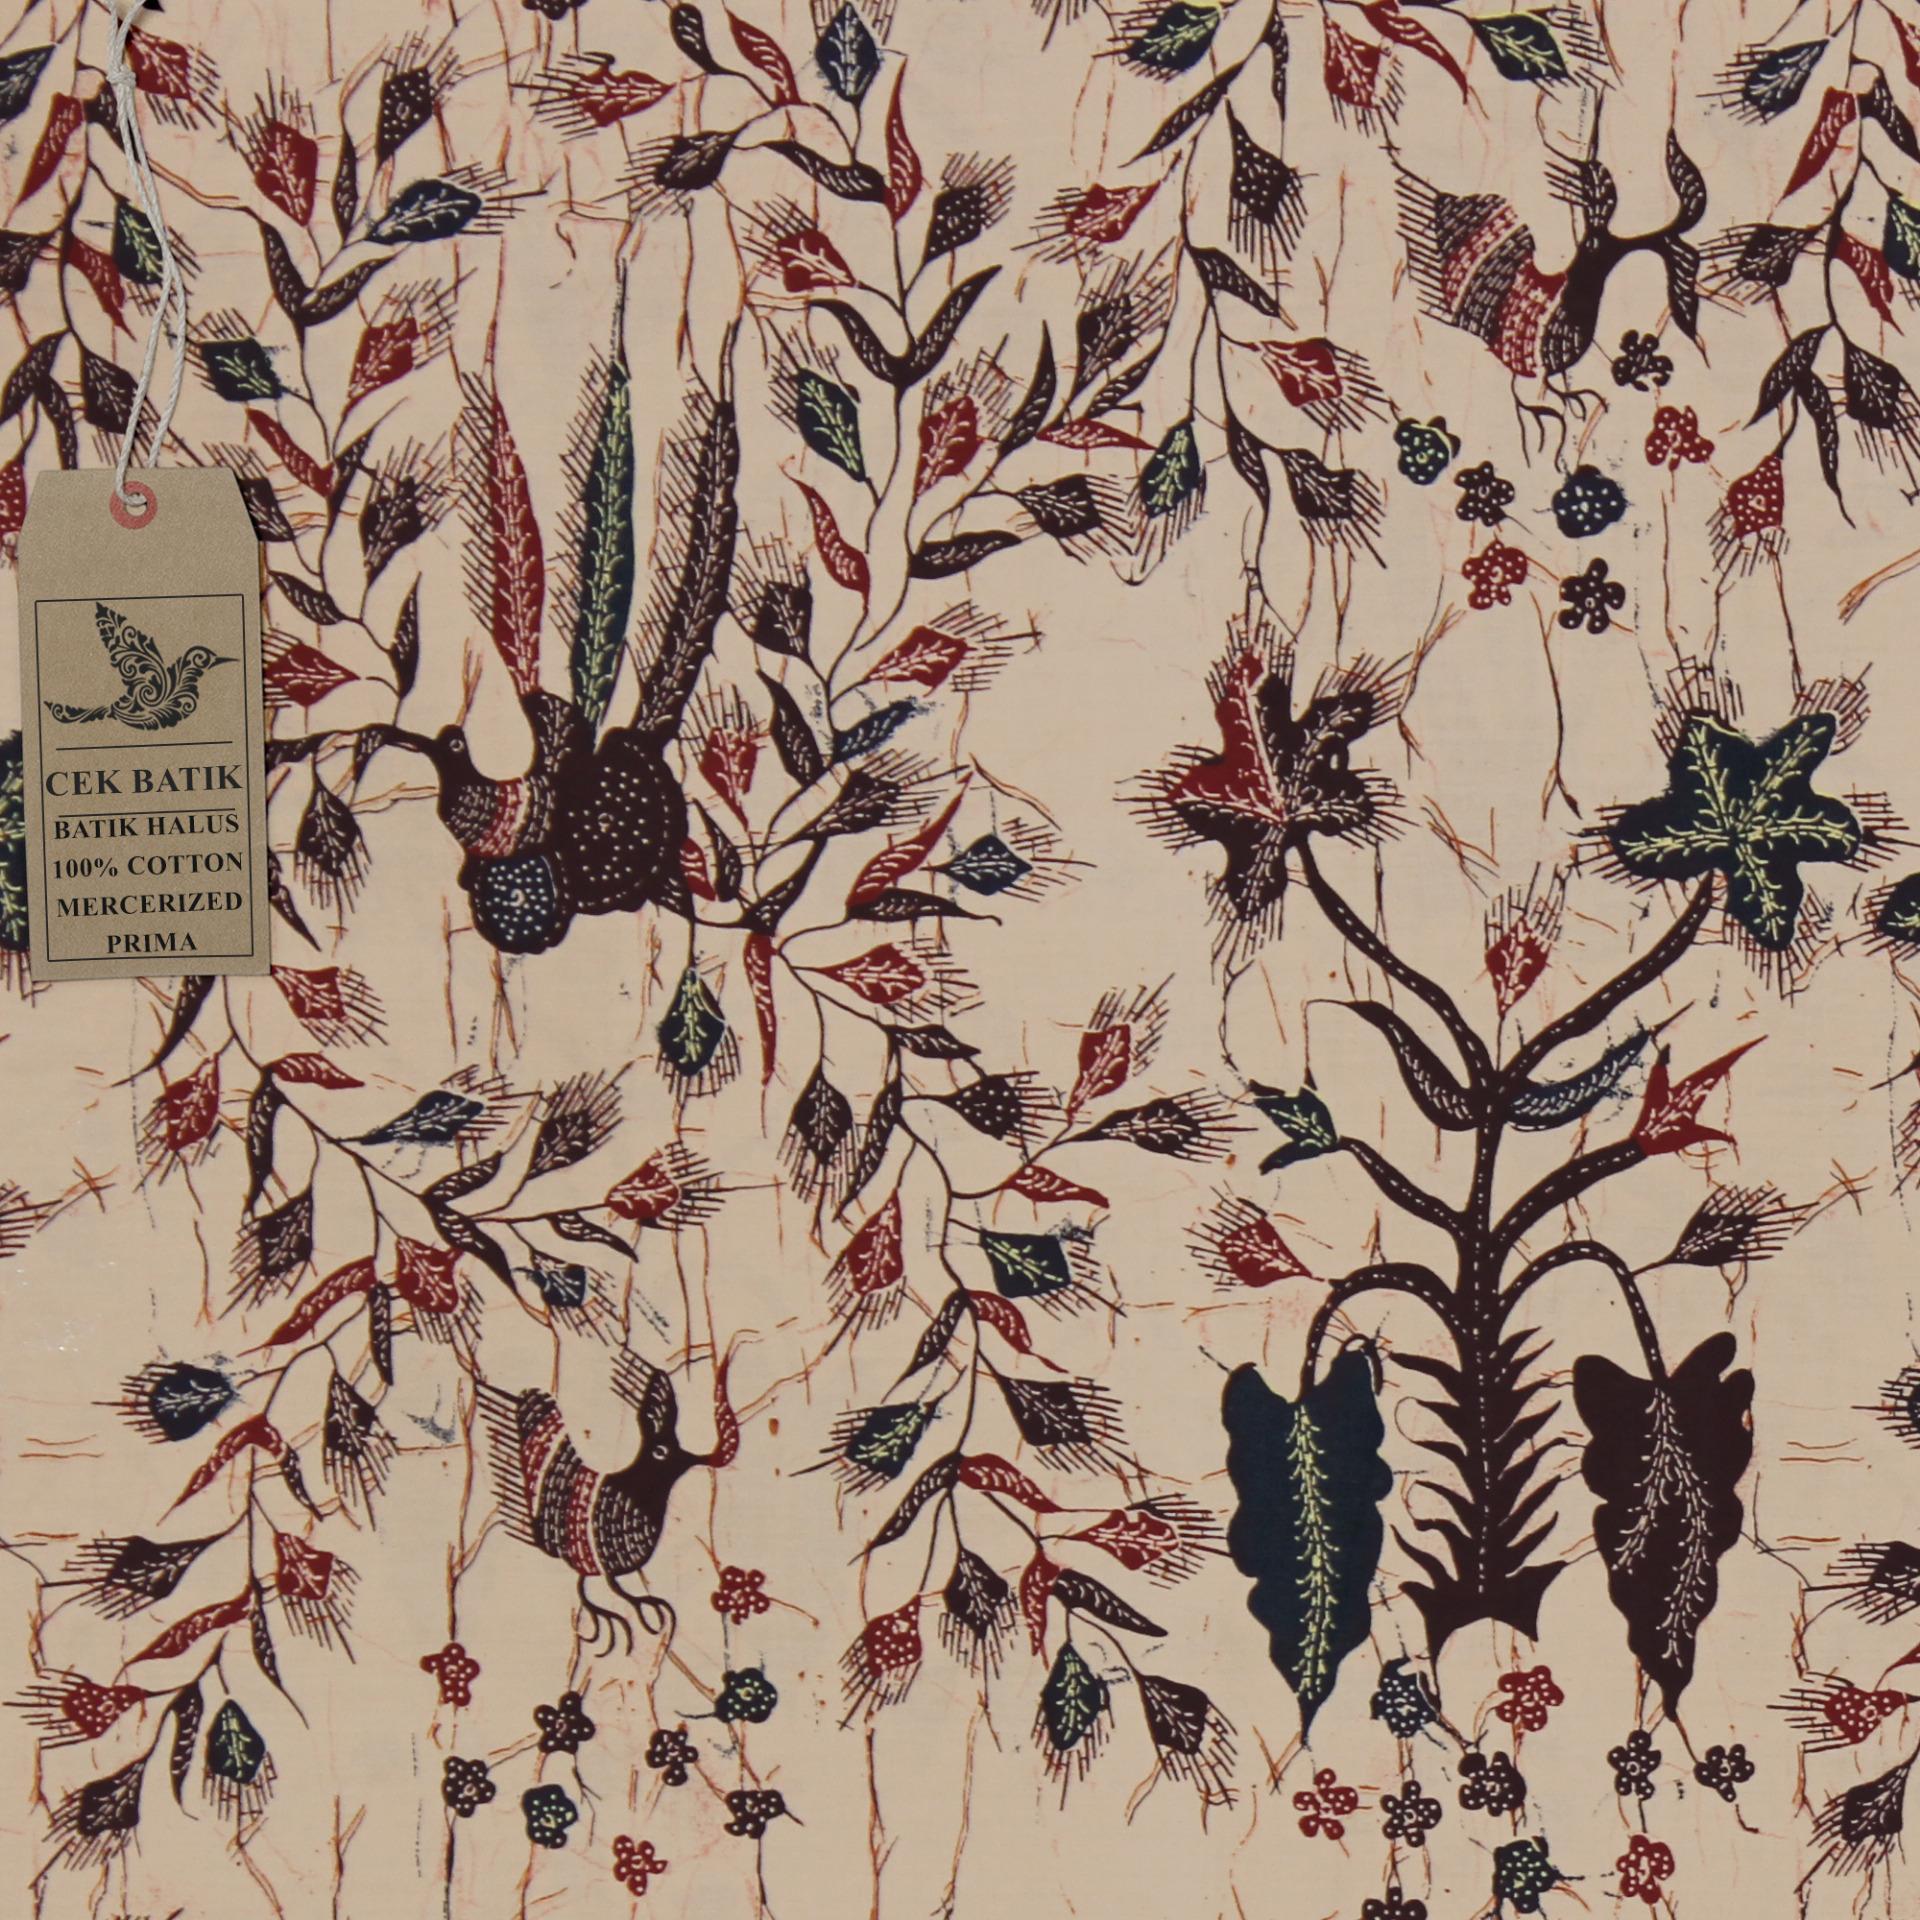 Cek Batik - Kain Batik Motif Unik Burung Sangkar Bunga Madura (Cream)